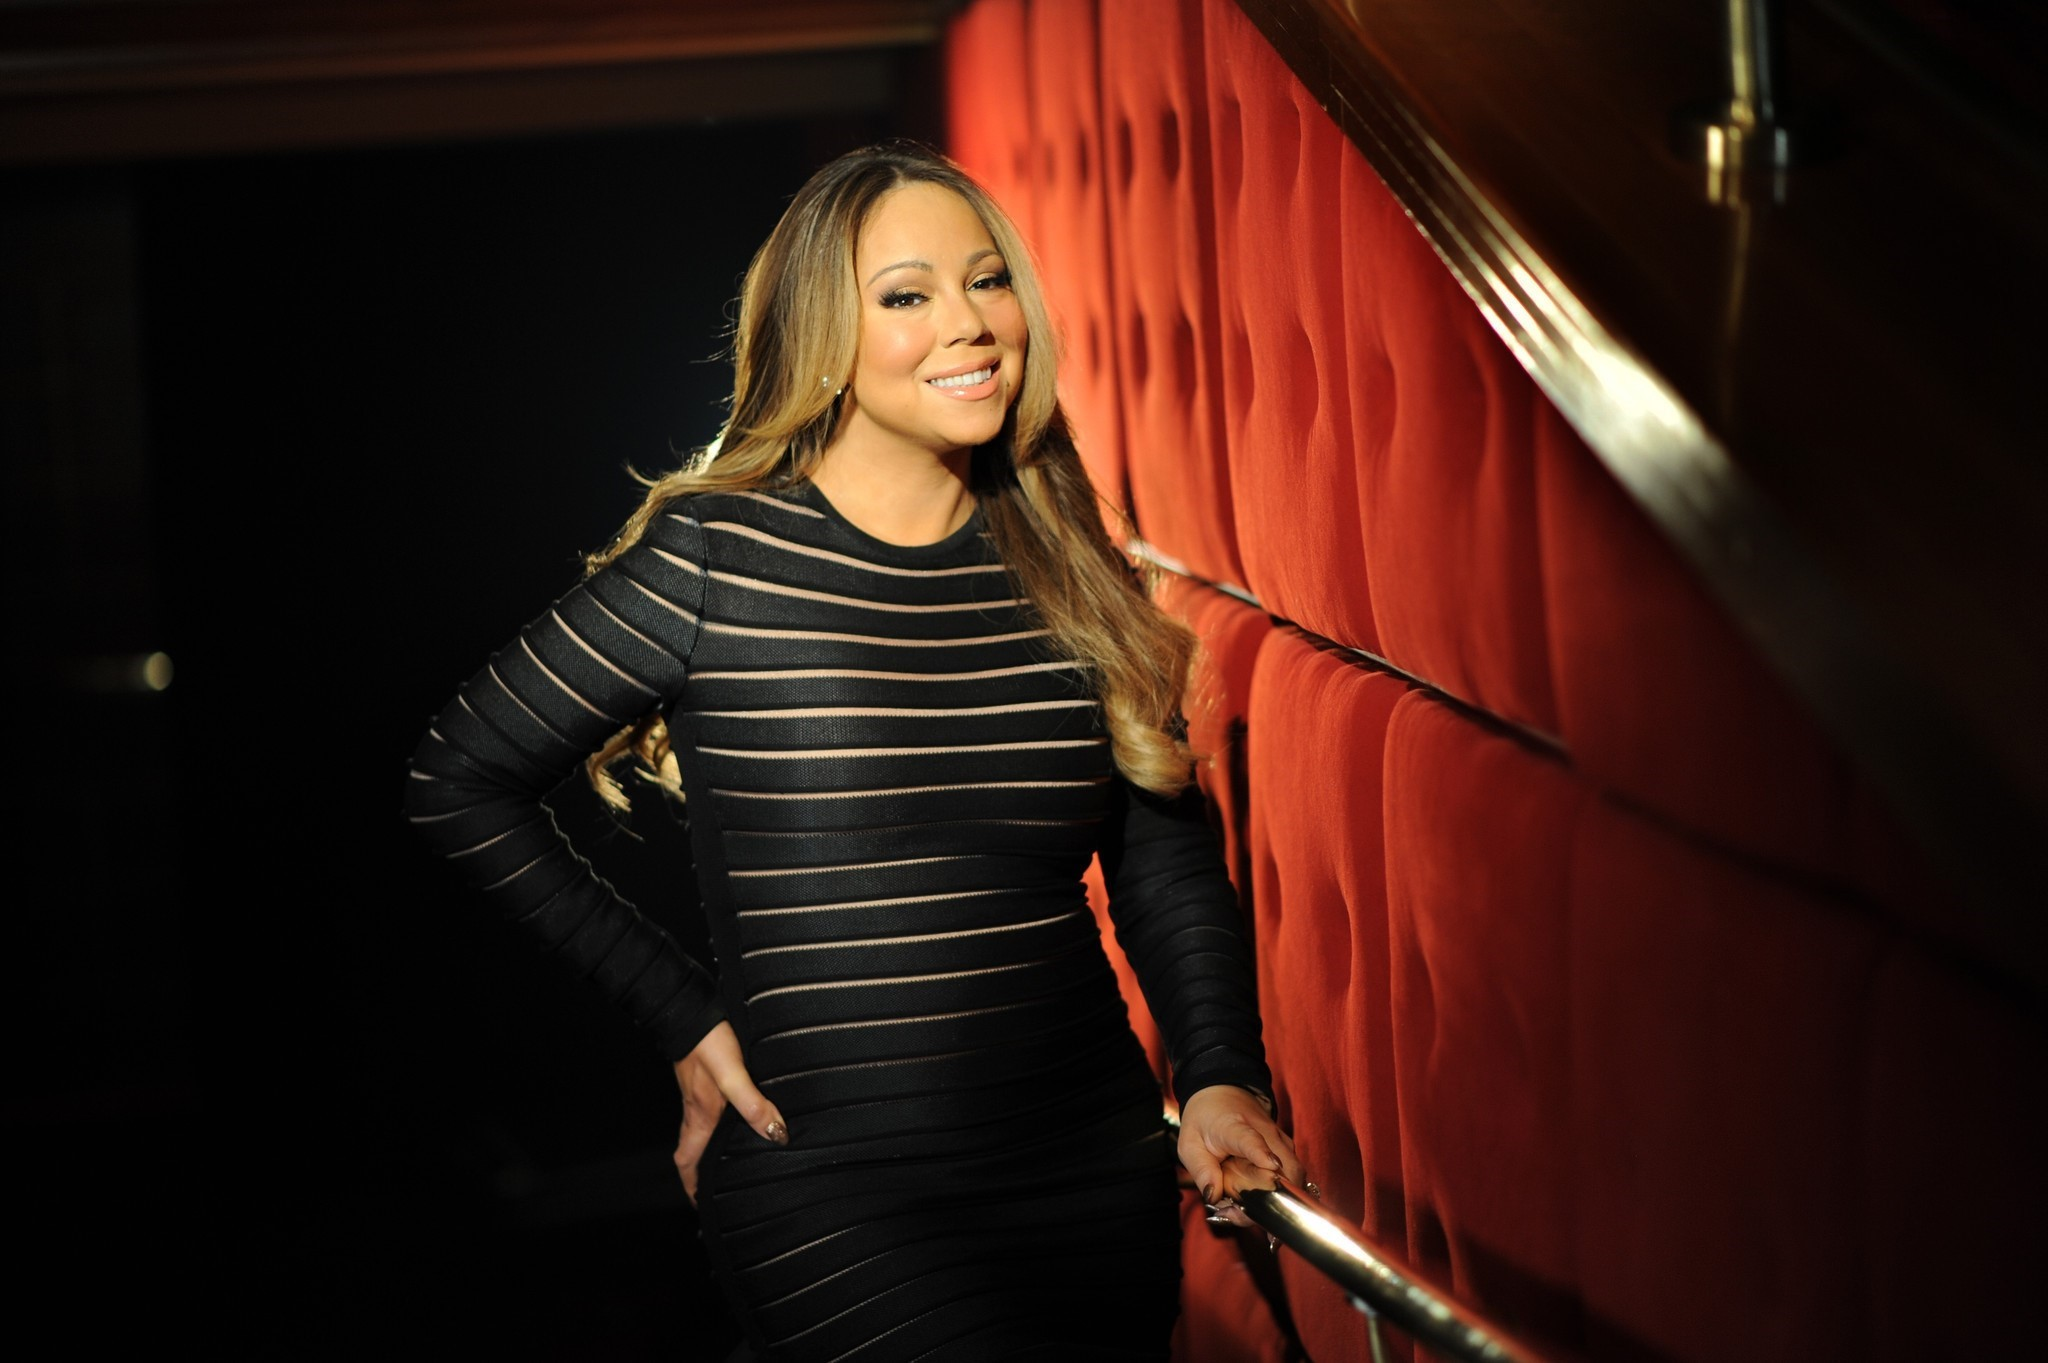 Mariah Carey Wallpapers for Computer